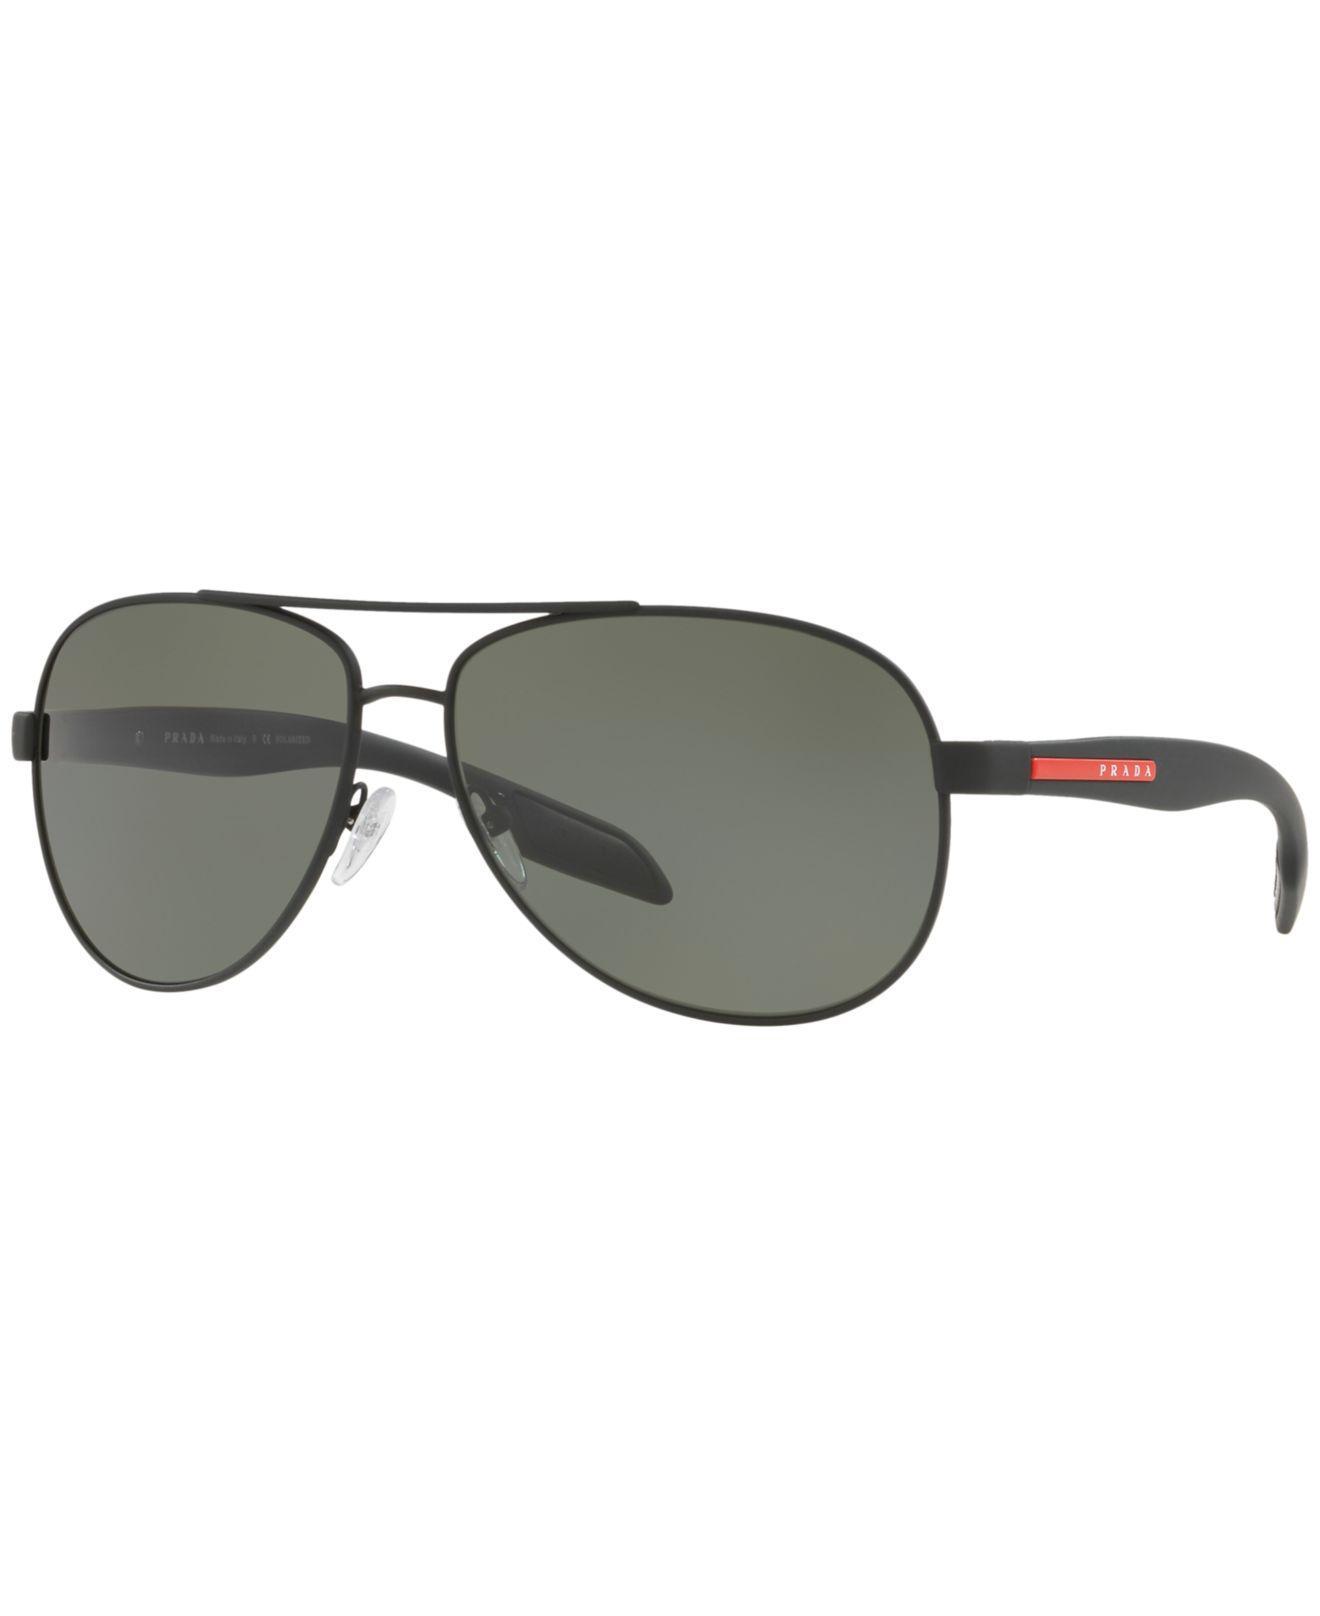 e6be9da7534 Lyst - Prada Sunglasses in Black for Men